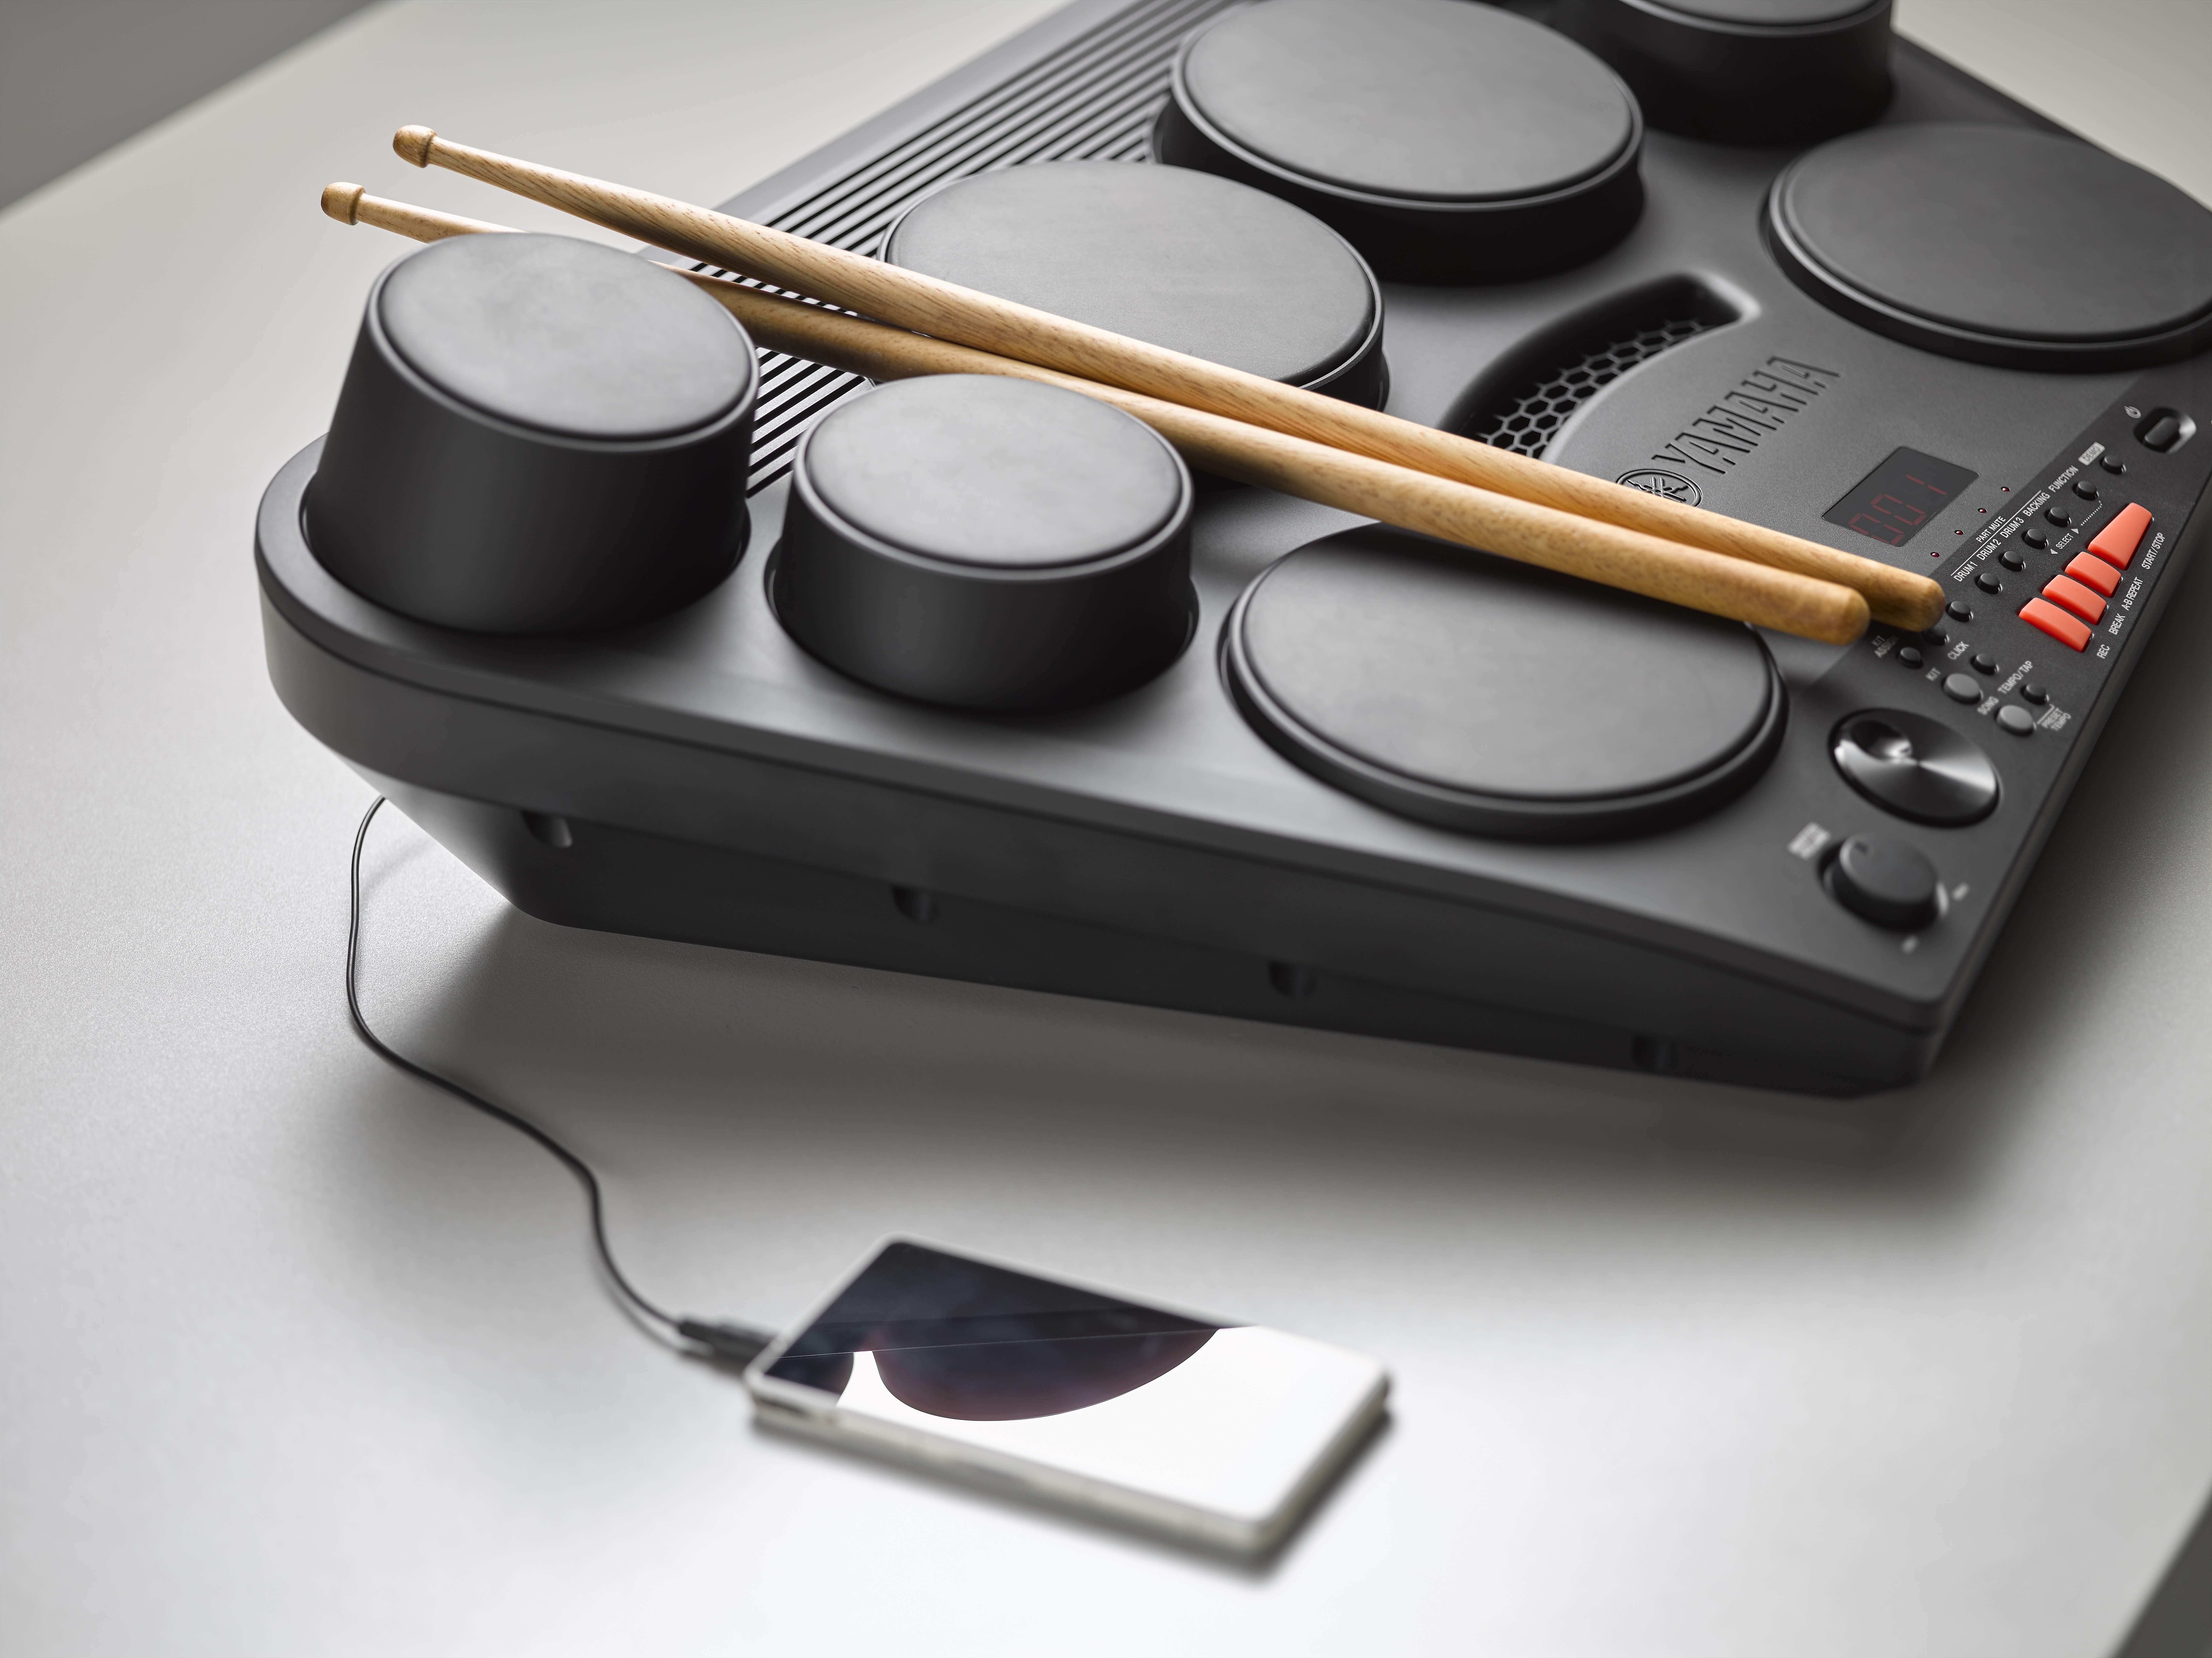 The yamaha dd 75 is a versatile portable drum set for the for Yamaha portable drums